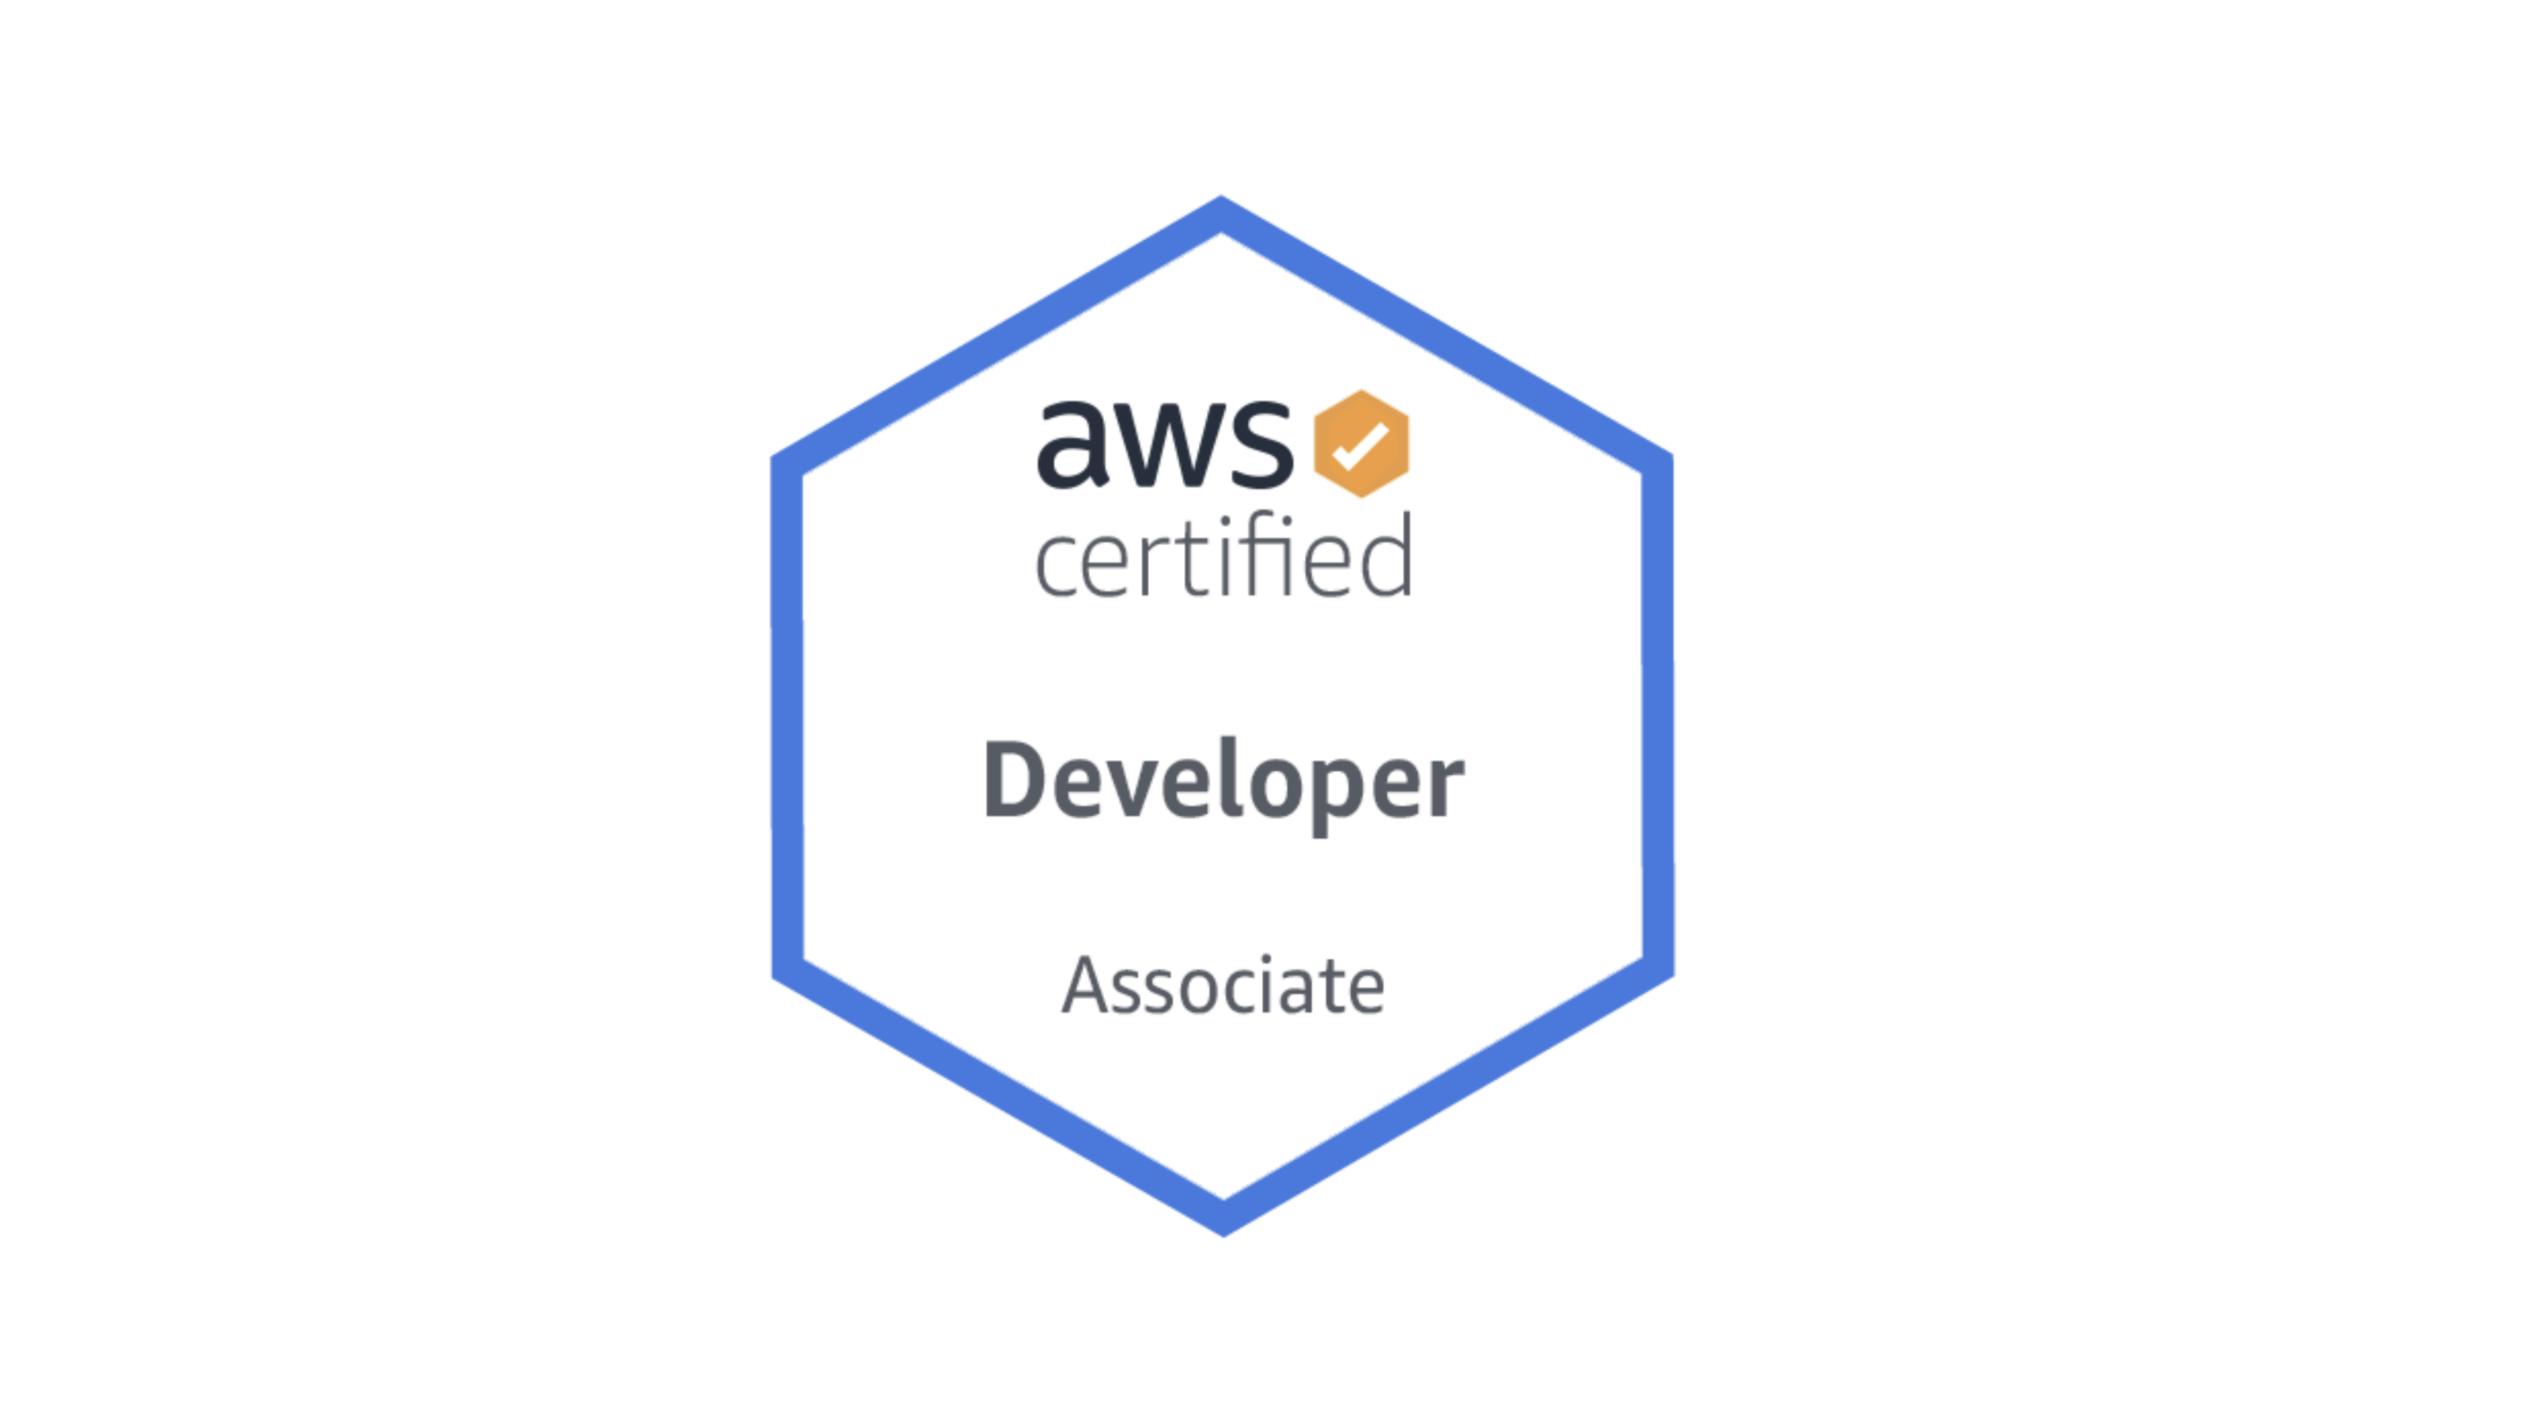 AWS Developer Associate 合格体験記/学習方法 [AWS認定4冠]